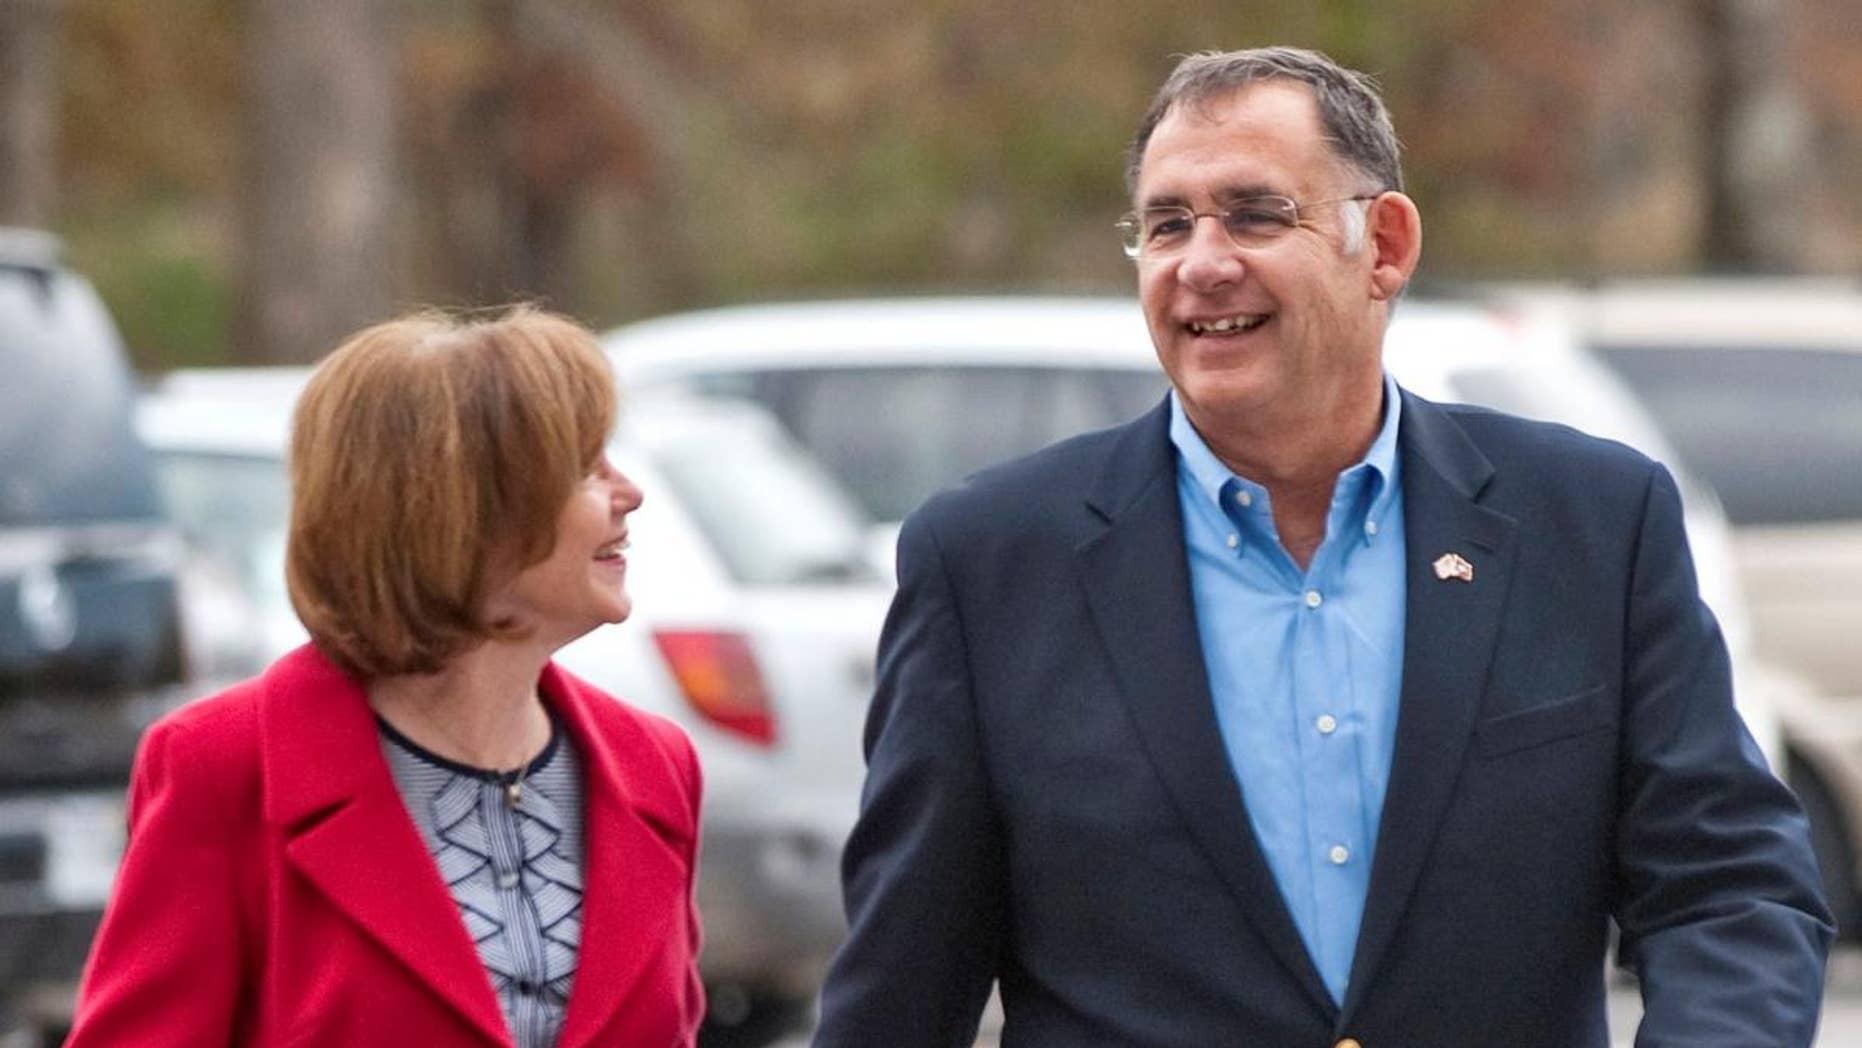 Sen. John Boozman walks with his wife, Cathy Boozman. (AP File Photo/Beth Hall)